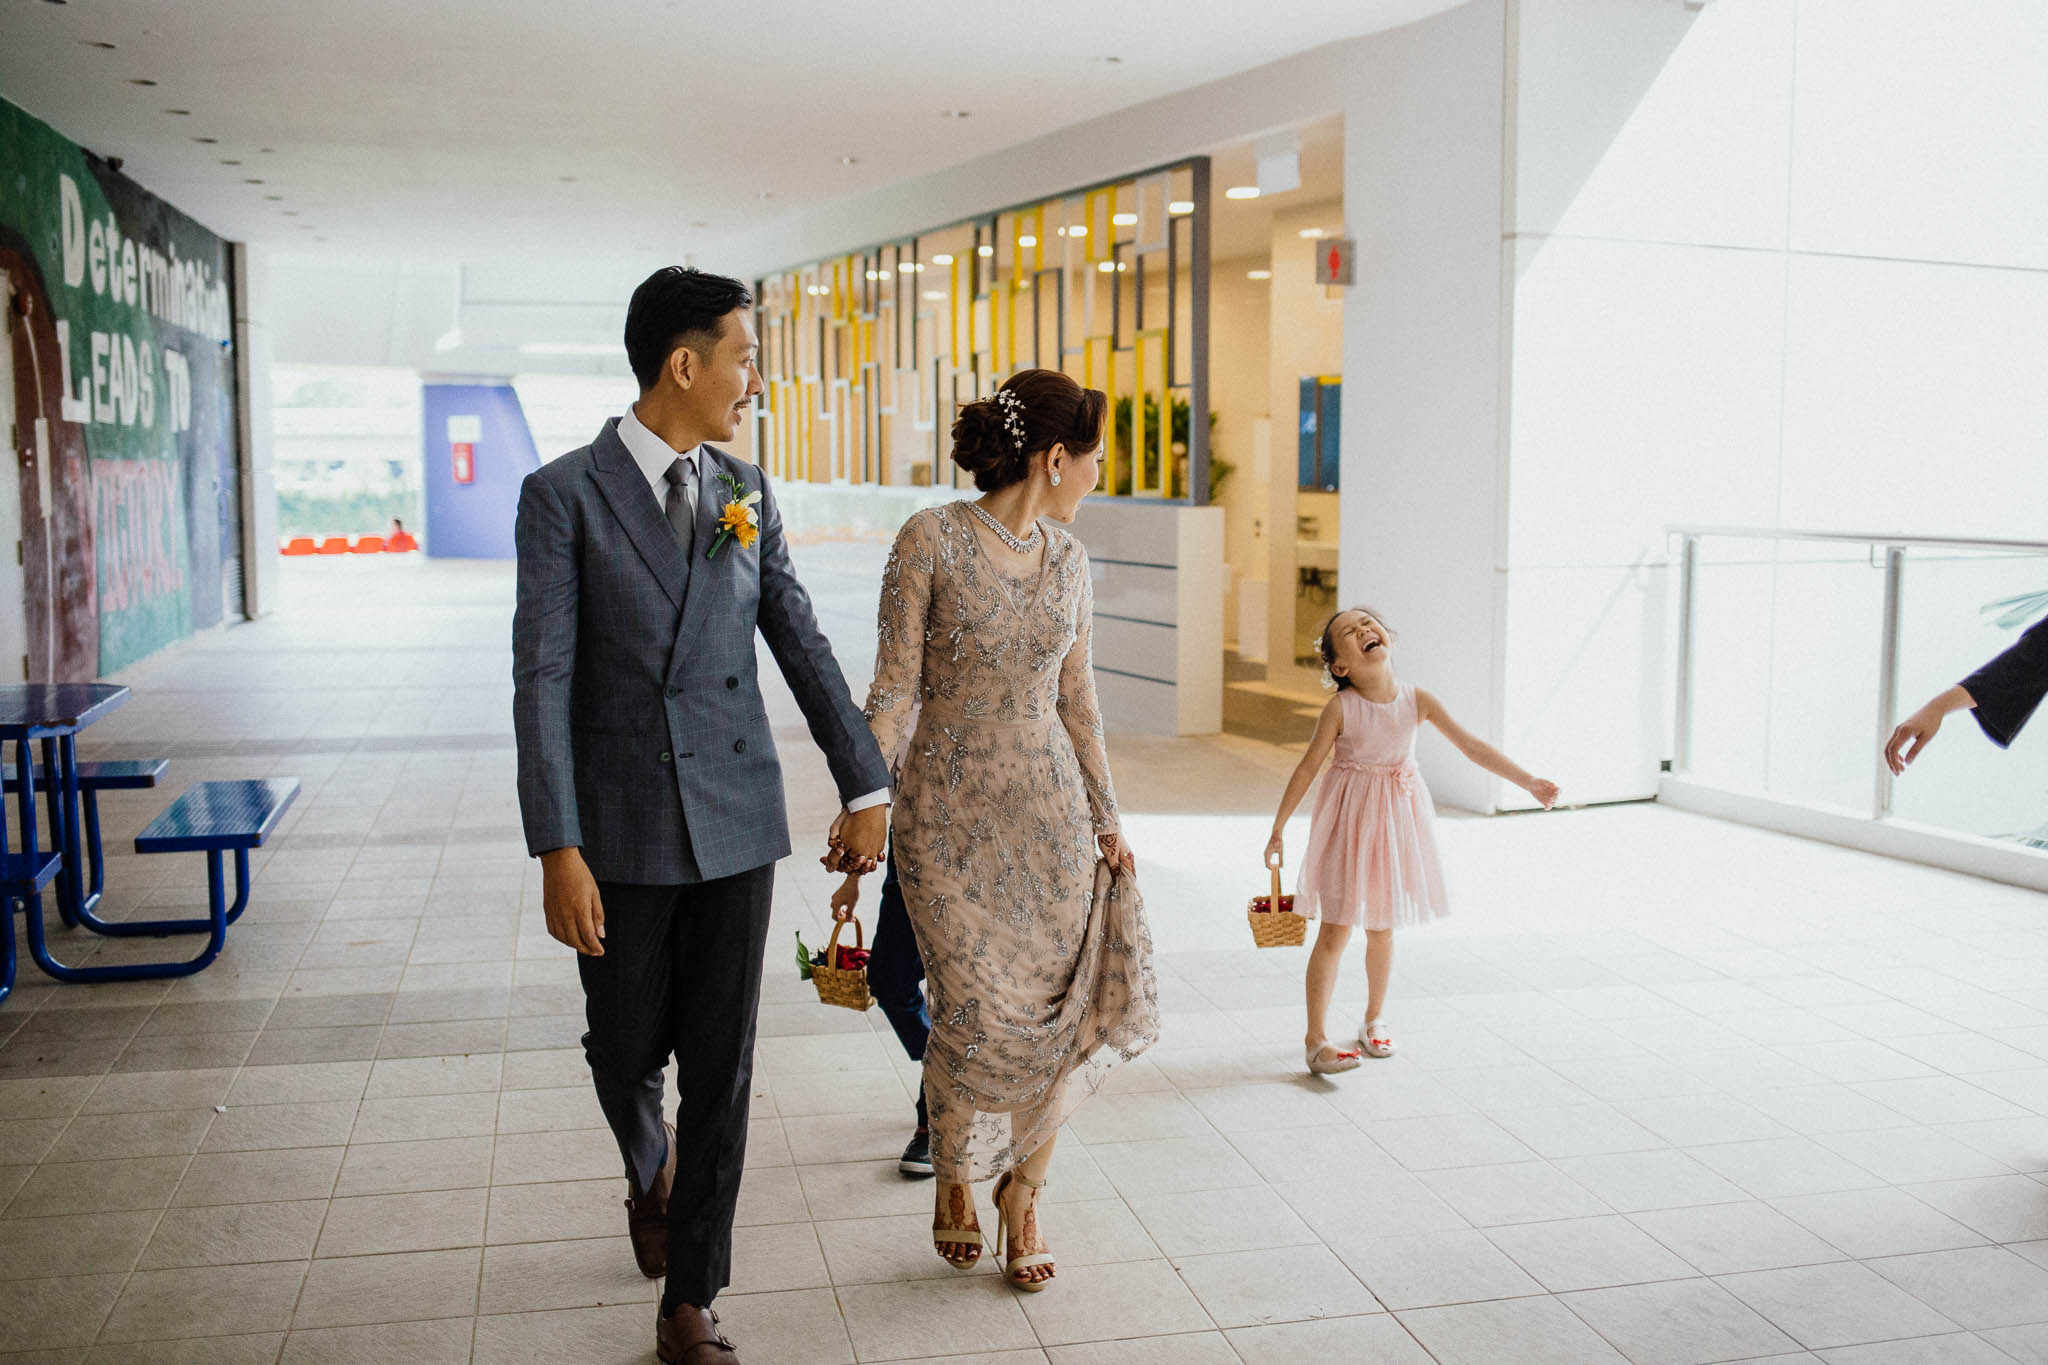 singapore-wedding-photographer-addafiq-nufail-041.jpg